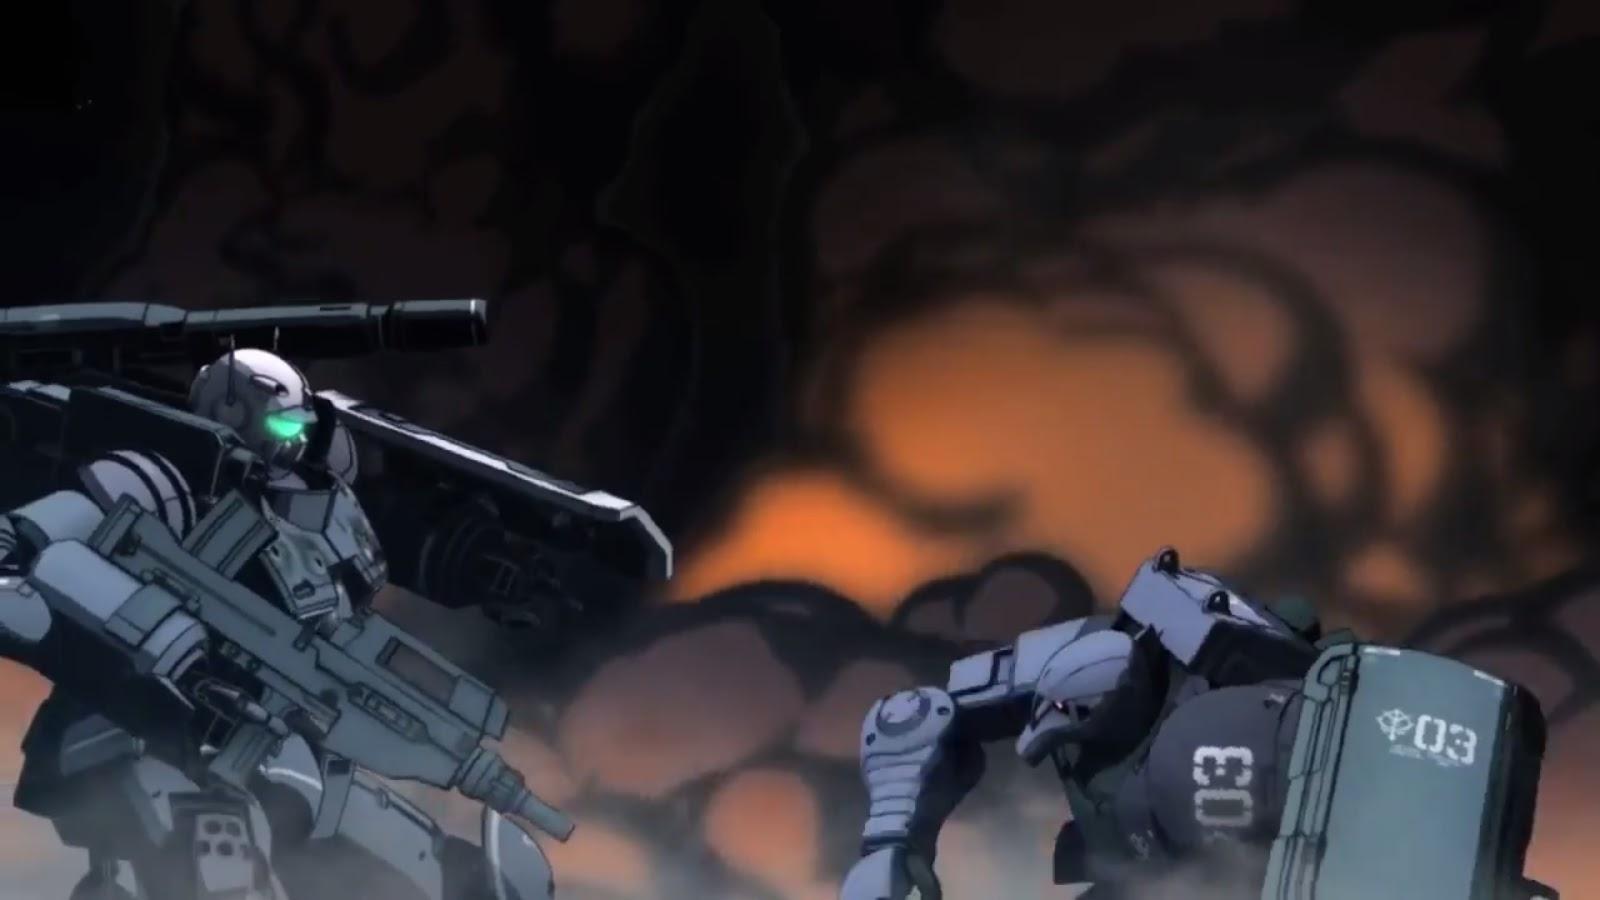 Mobile Suit Gundam The Origin IV Battle Action PV + Theme Song